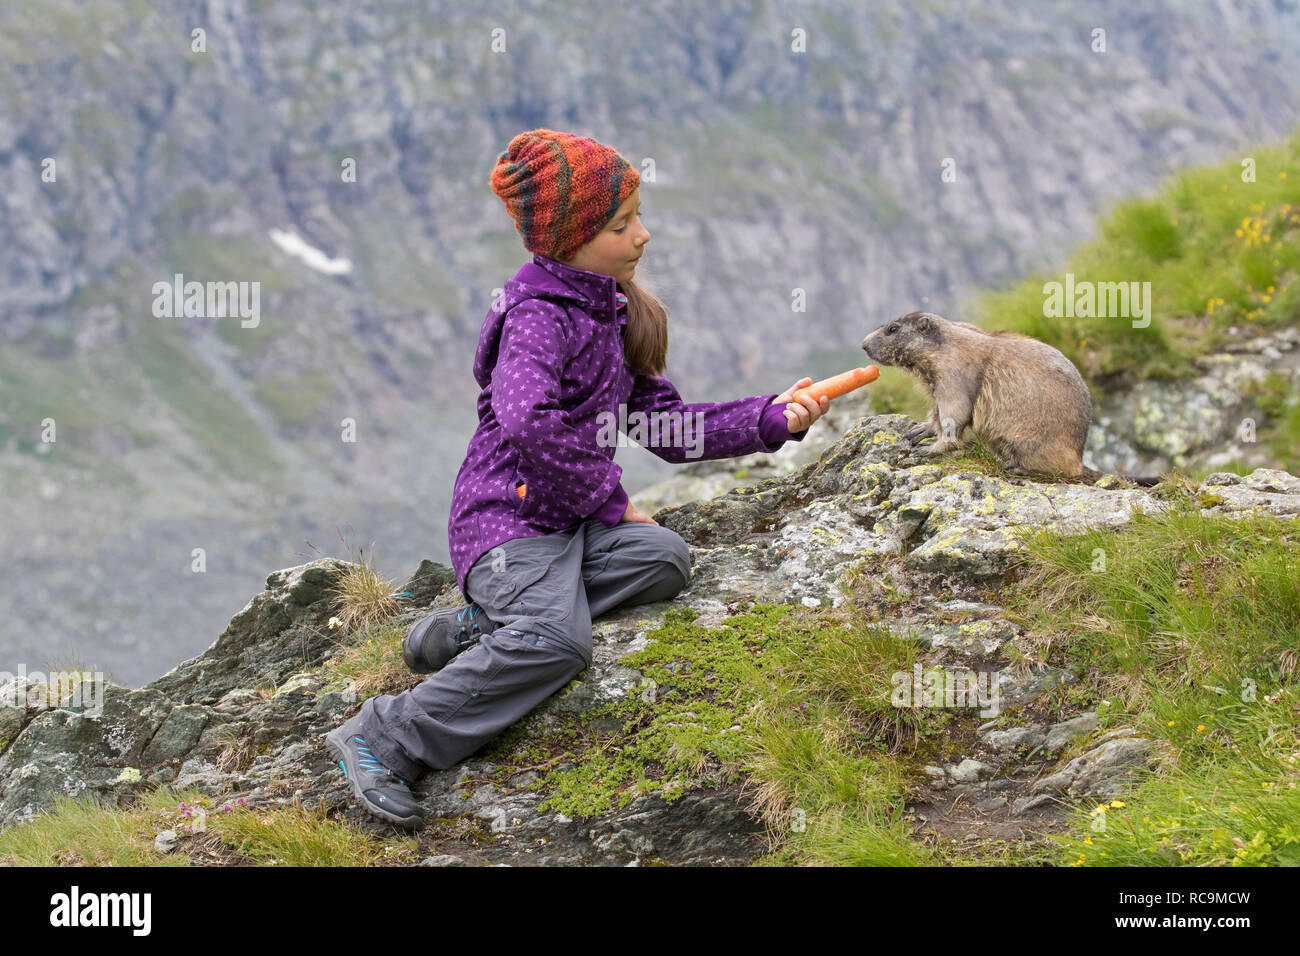 Child feeding carrot to tame Alpine marmot (Marmota marmota) in summer in the Alps - Stock Image